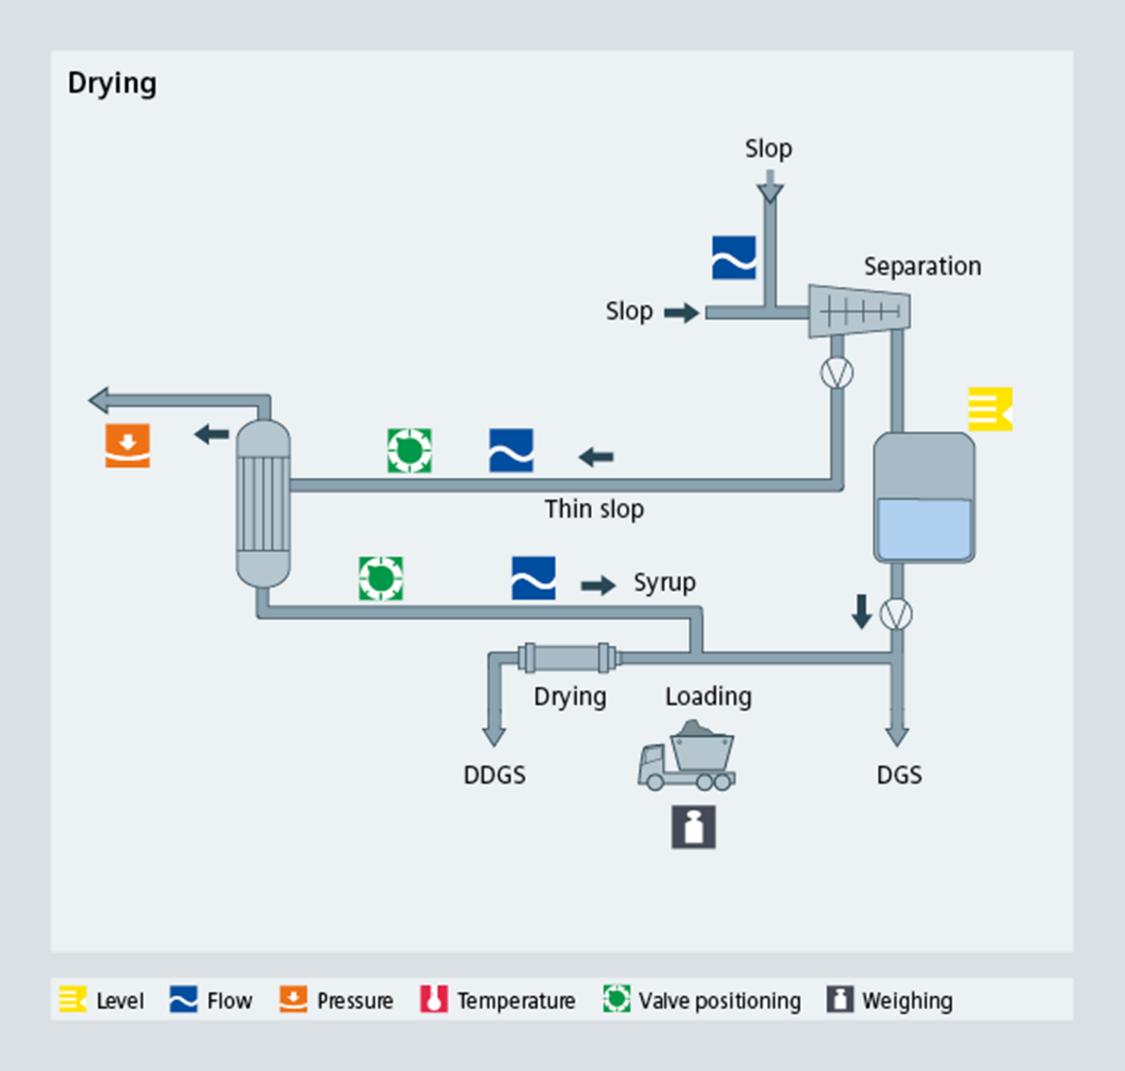 Bioethanol drying process diagram - Siemens USA